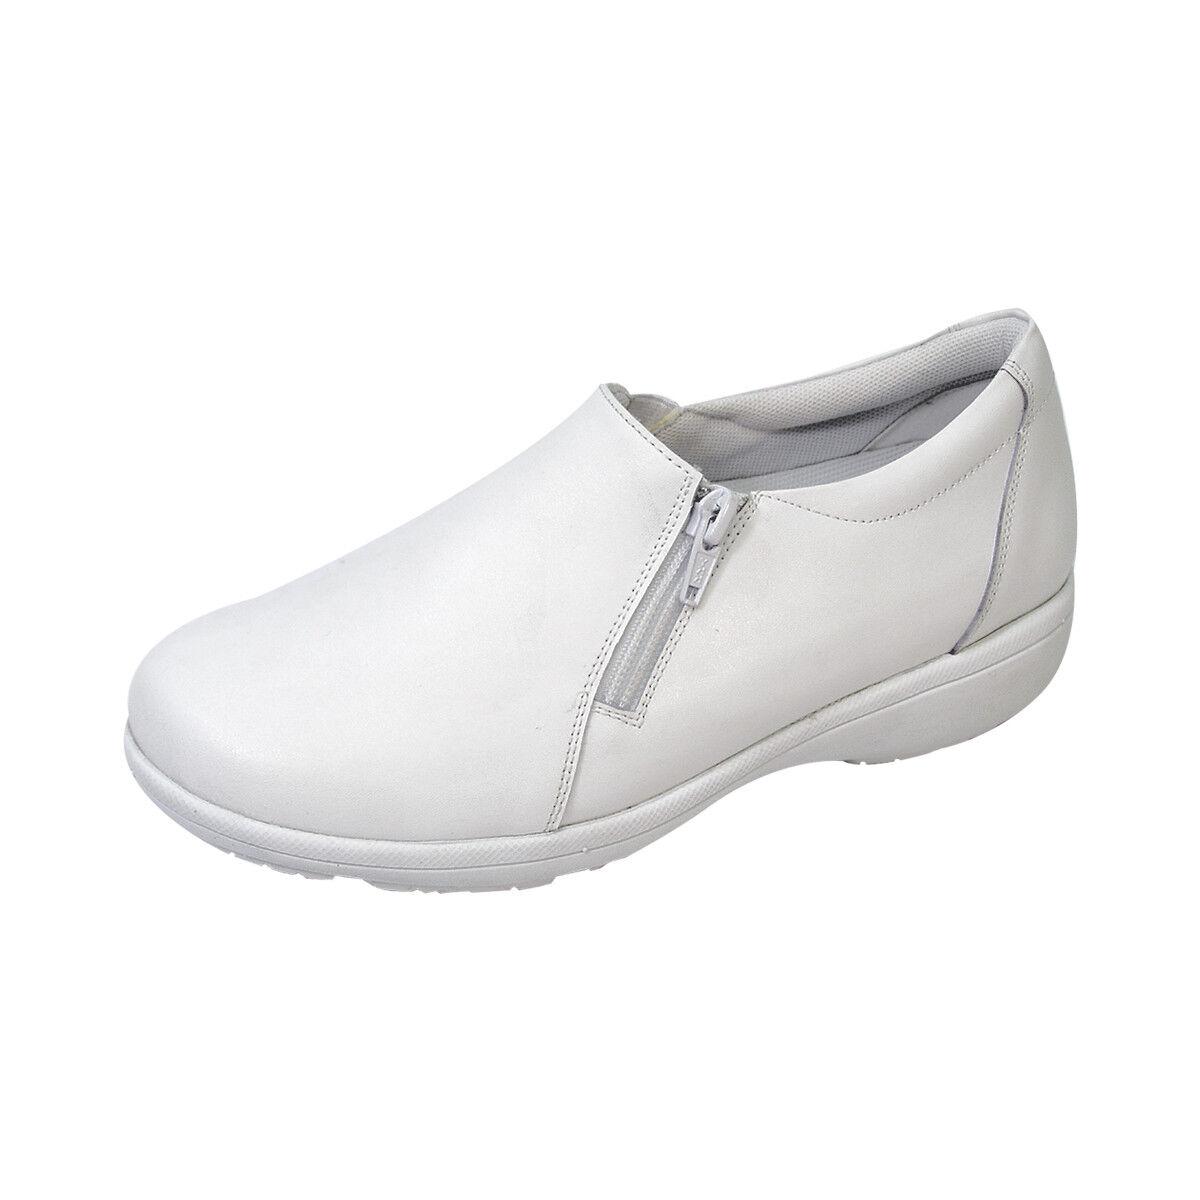 24 HOUR COMFORT Ester damen Adjustable Wide Width Simple Classic Slip Slip Classic On Loafer f39e51